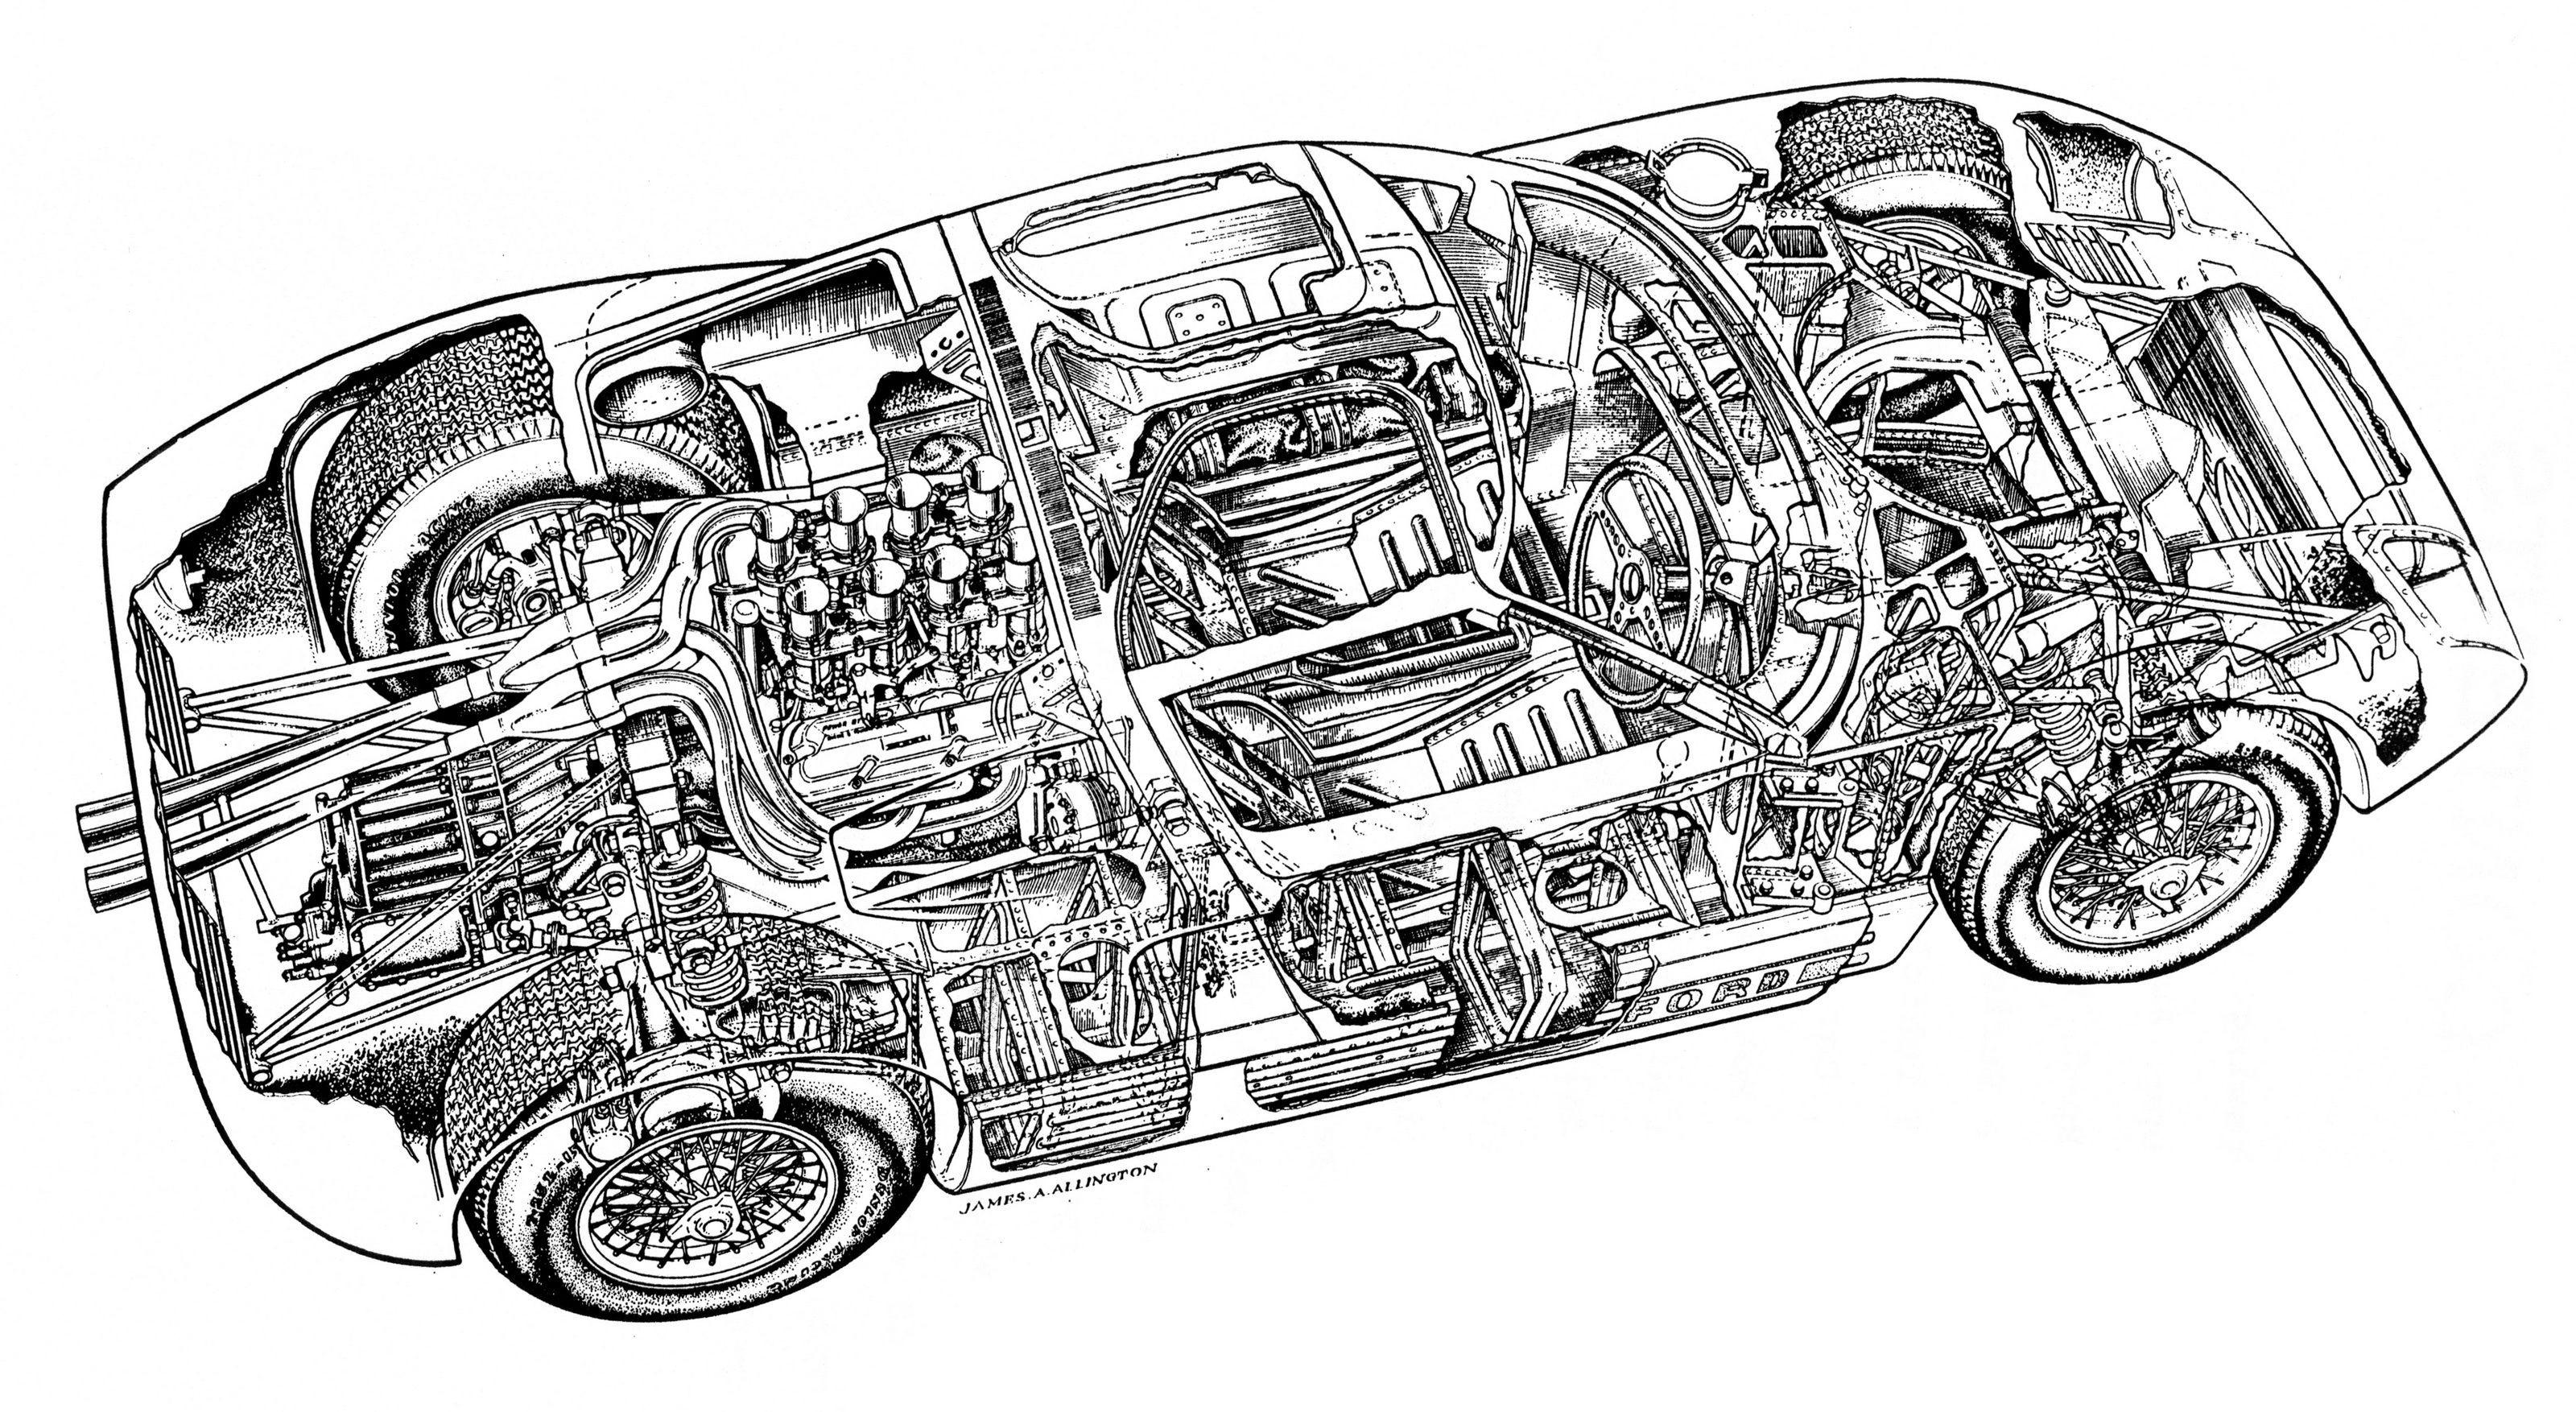 w16 engine diagram bugatti veyron engine diagram for pinterest wiring  diagram for you of w16 engine